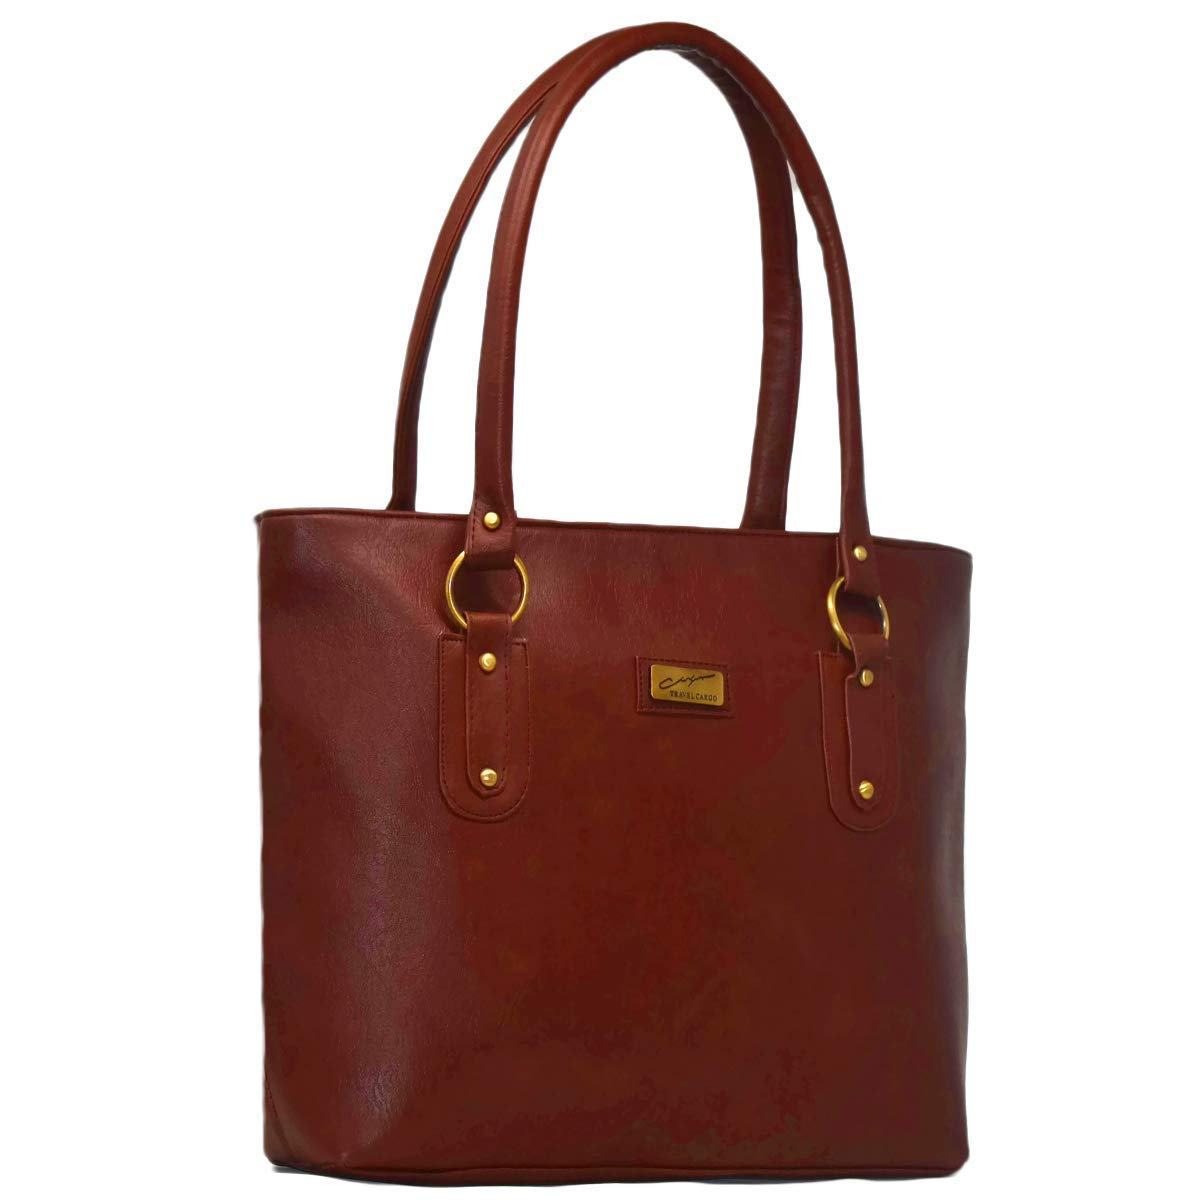 1b0bcdaff4 Pynk Fashion Leather Women s Handbag - Tan  Amazon.in  Shoes   Handbags